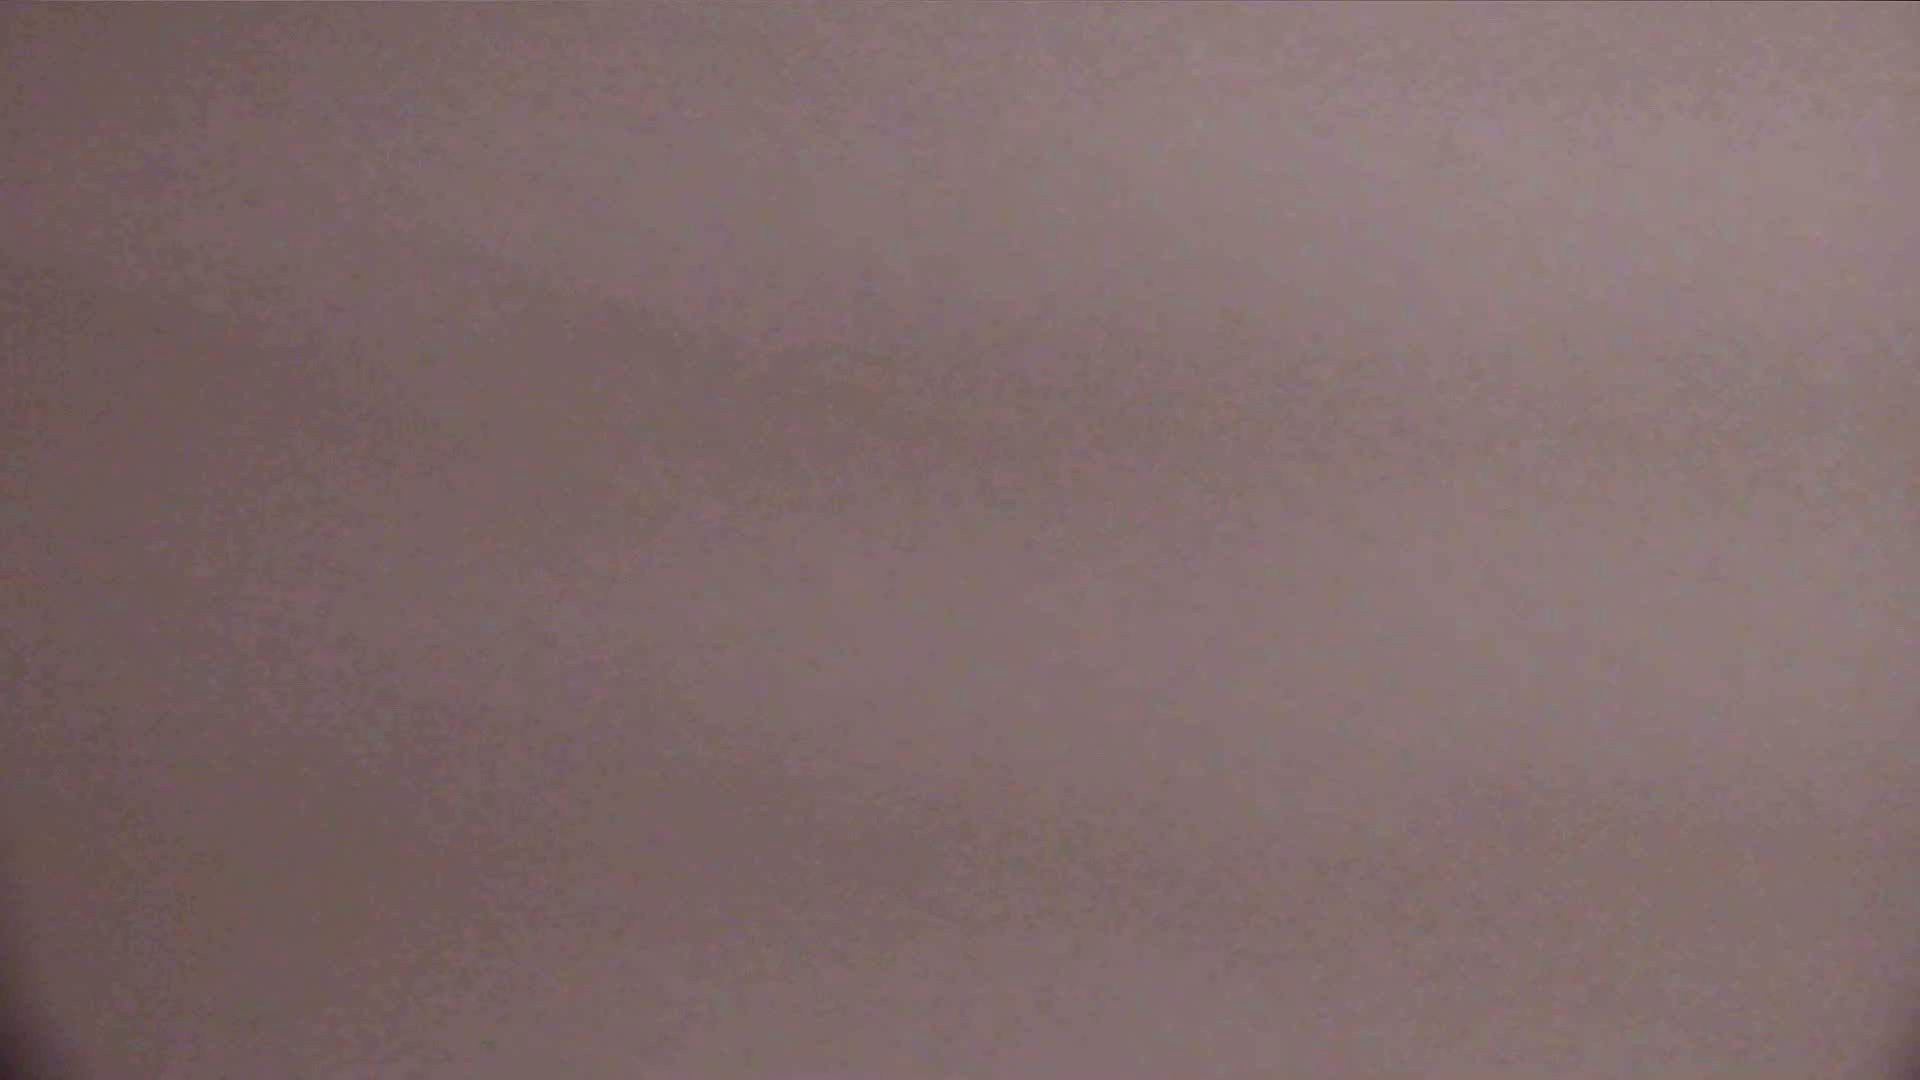 vol.17 命がけ潜伏洗面所! 張り裂けんばかりの大物 プライベート 盗撮ワレメ無修正動画無料 108画像 11